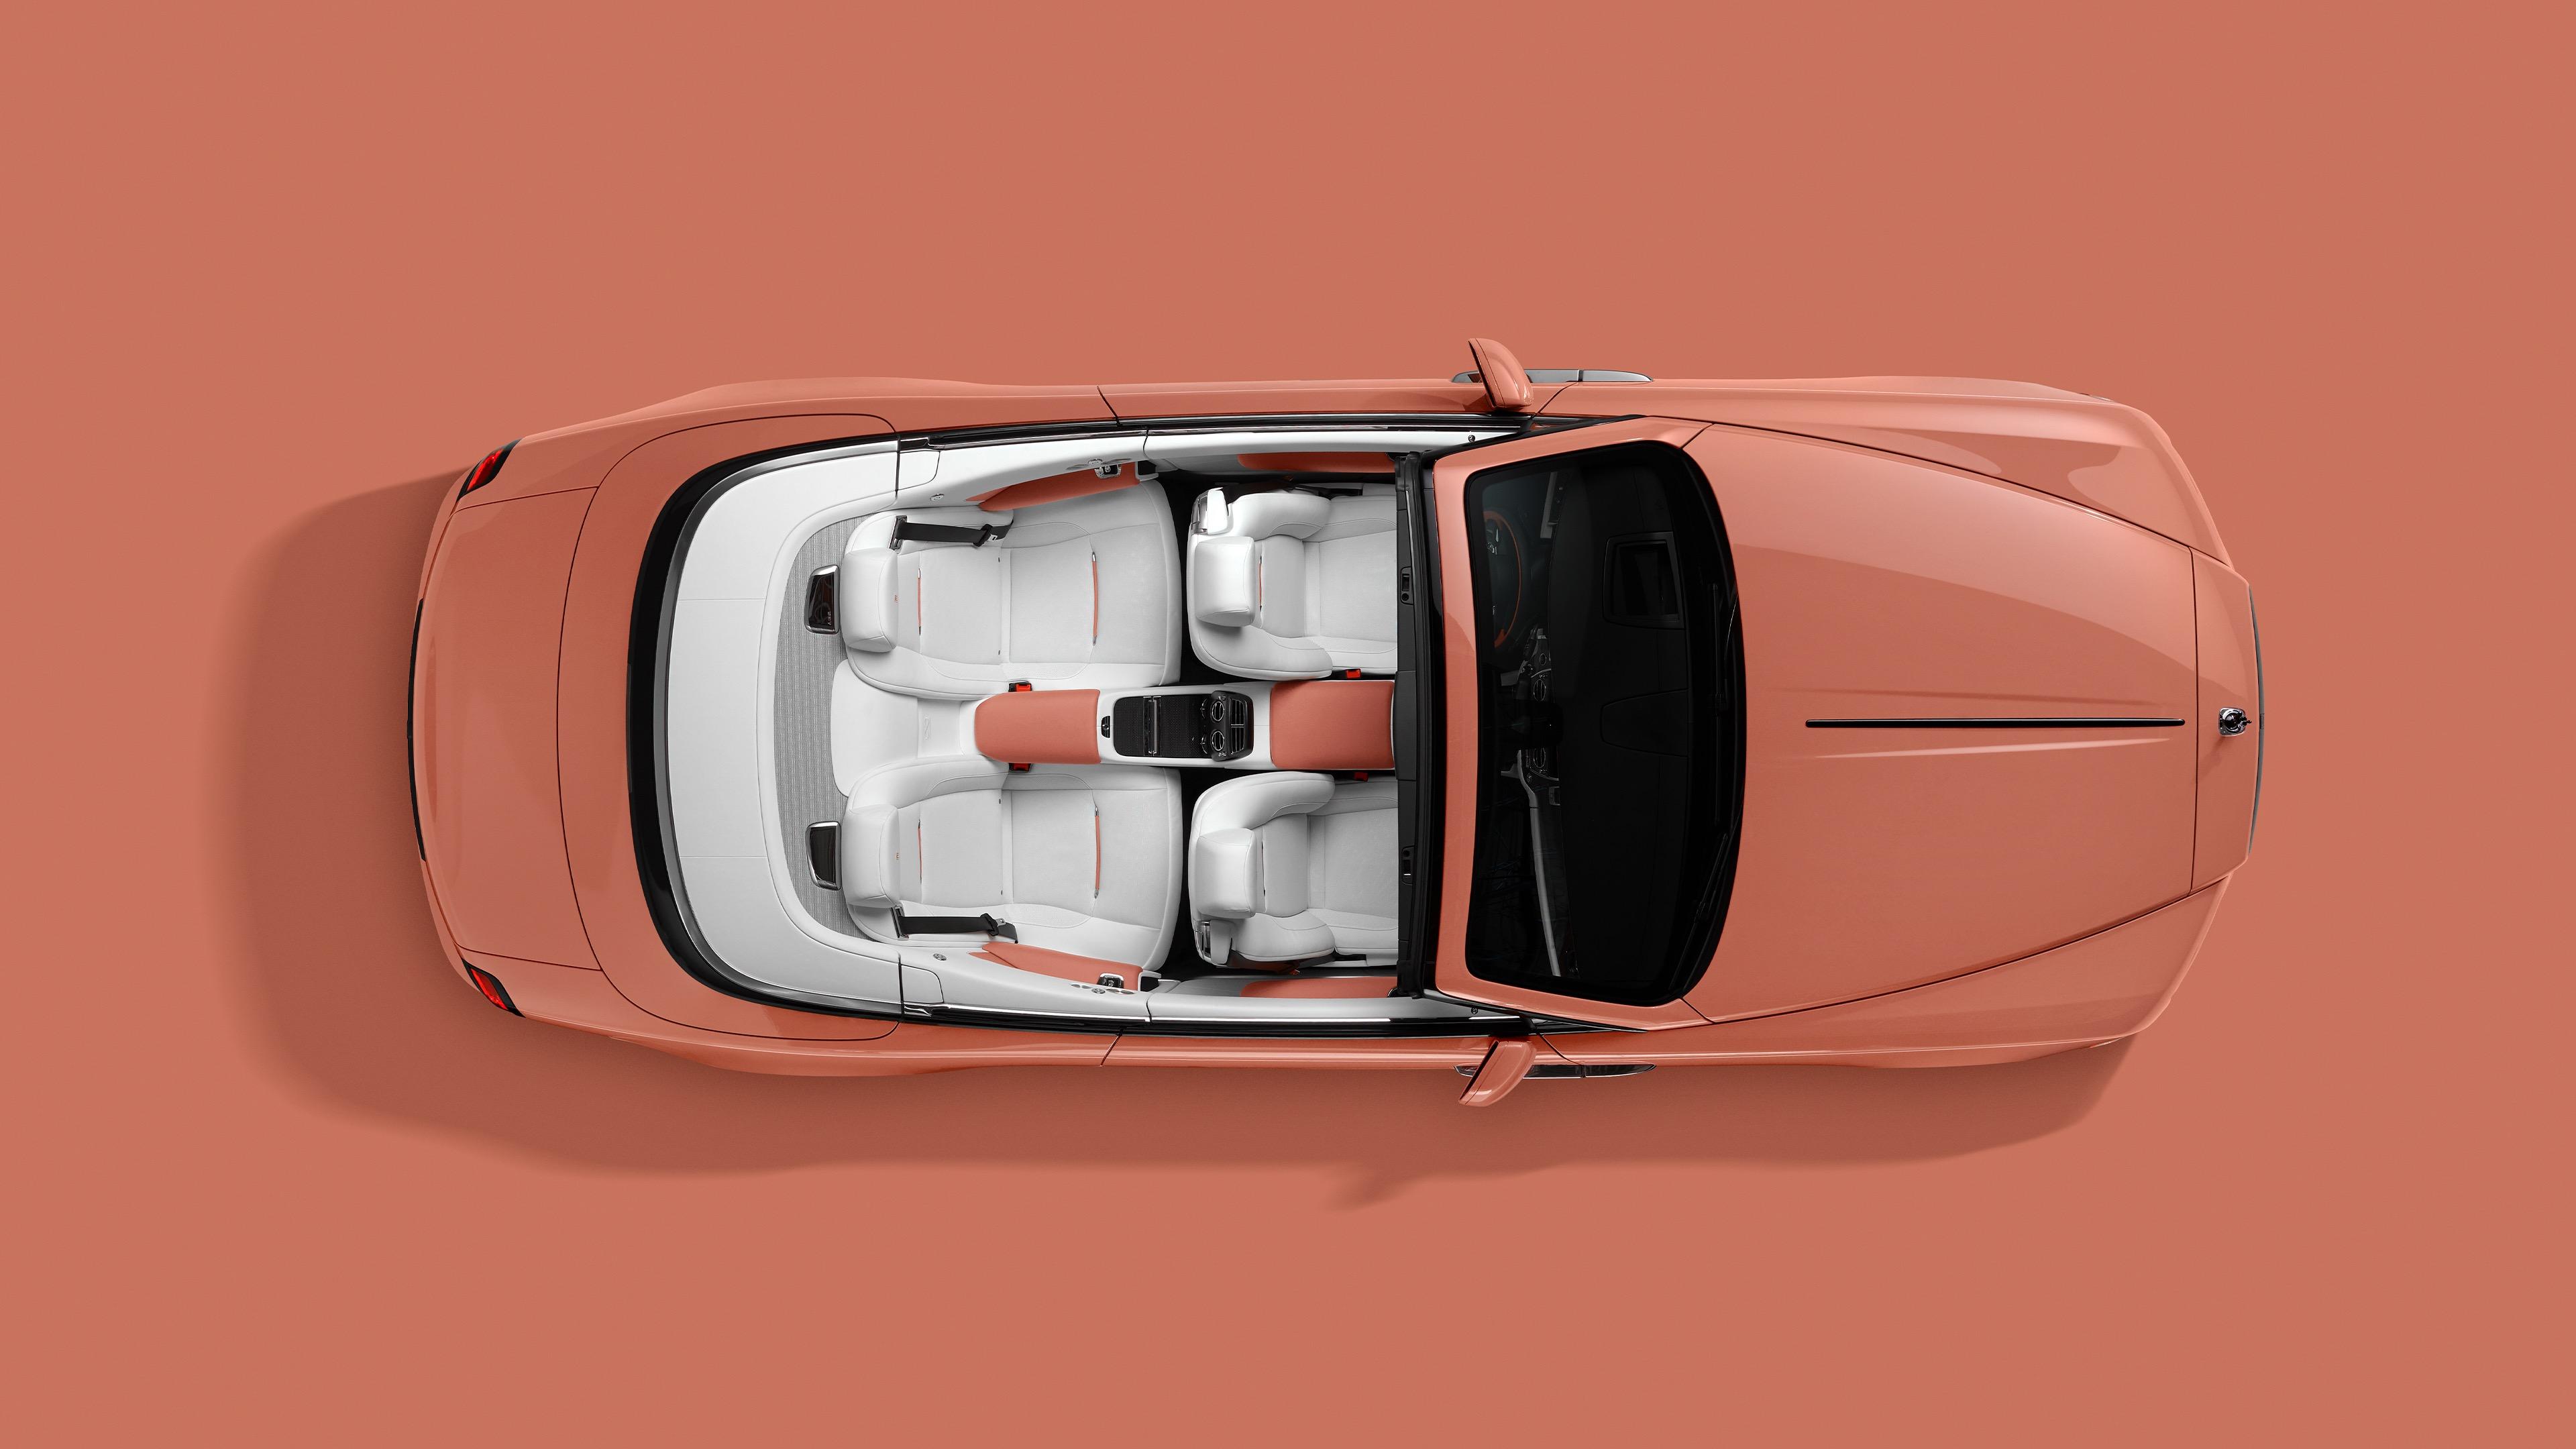 Rolls-Royce Motor Cars: Pebble Beach Pastel Collection